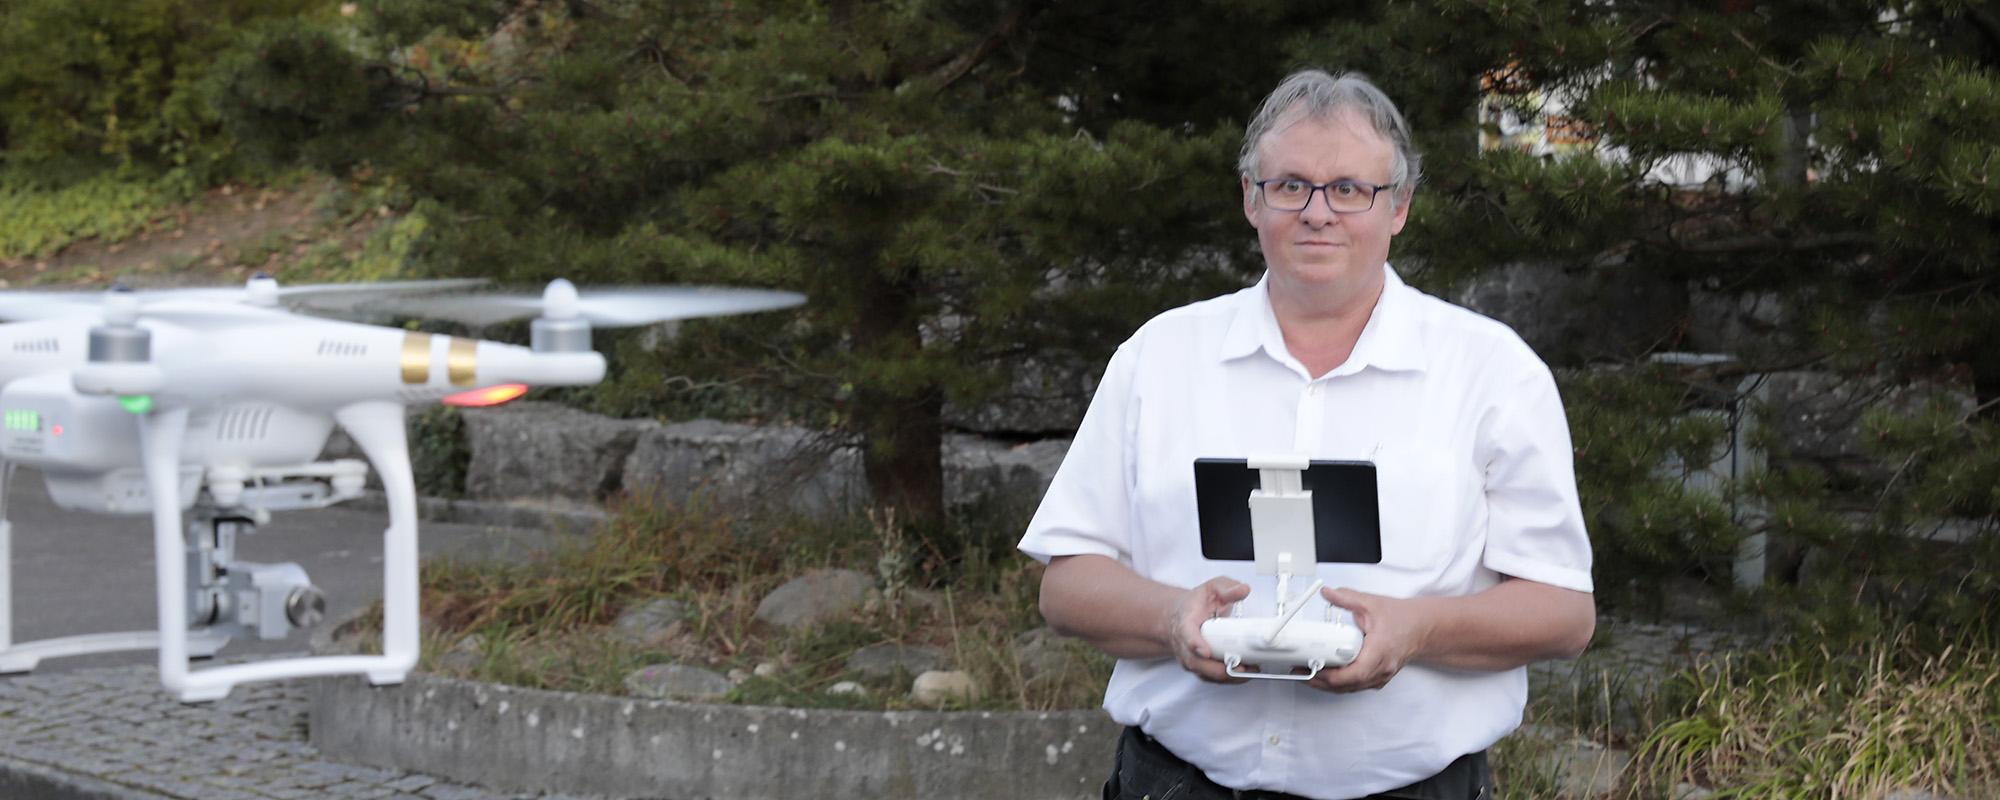 Felix Brodmann mit Drohne